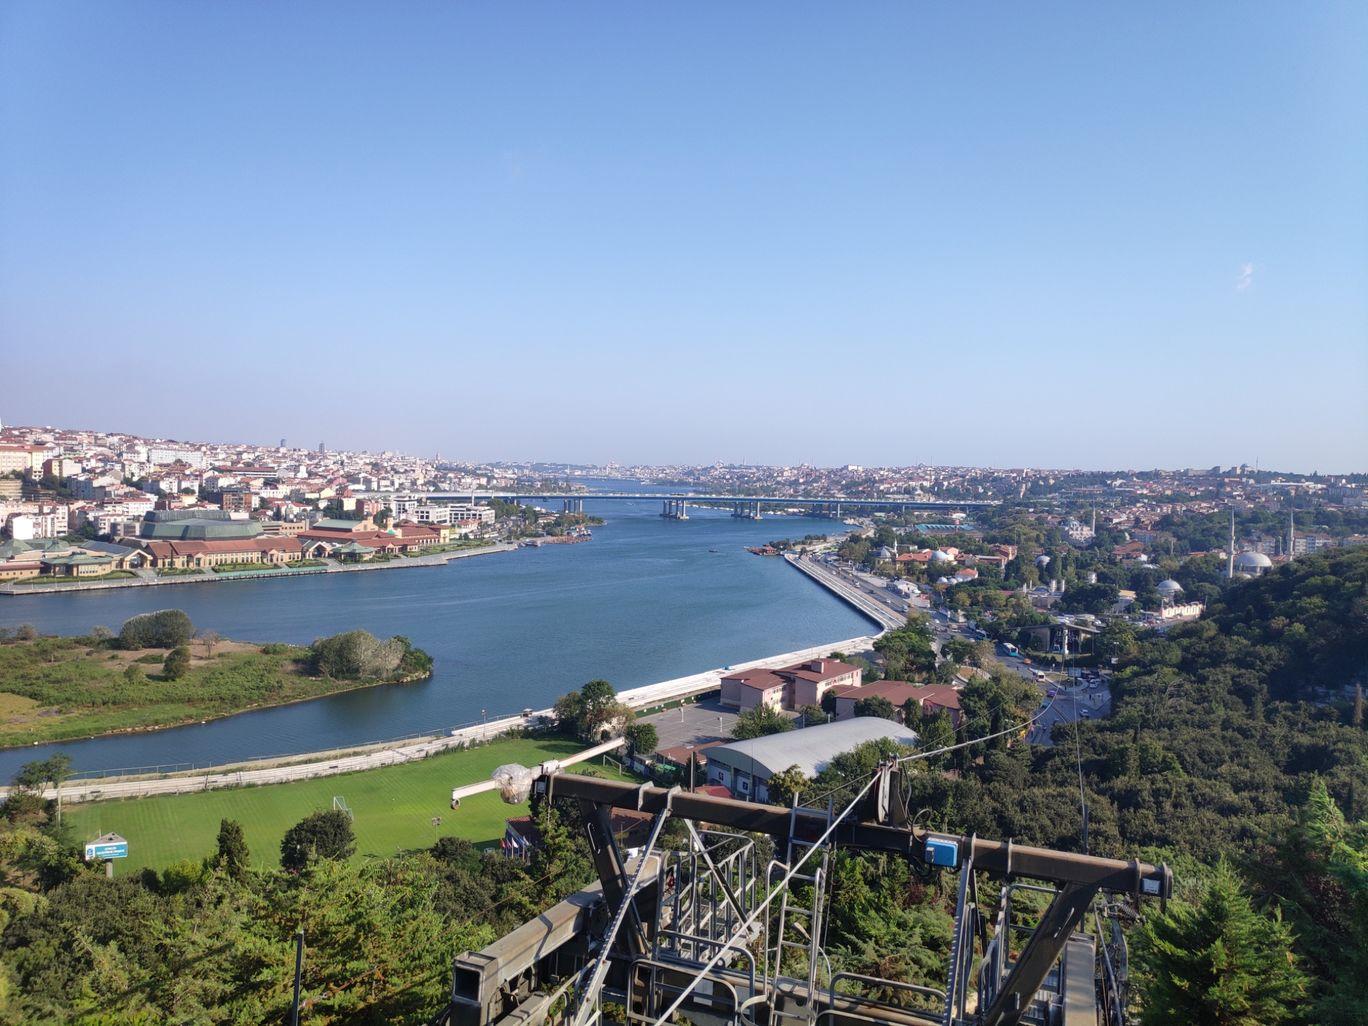 Photo of İstanbul By Halil İbrahim Şan